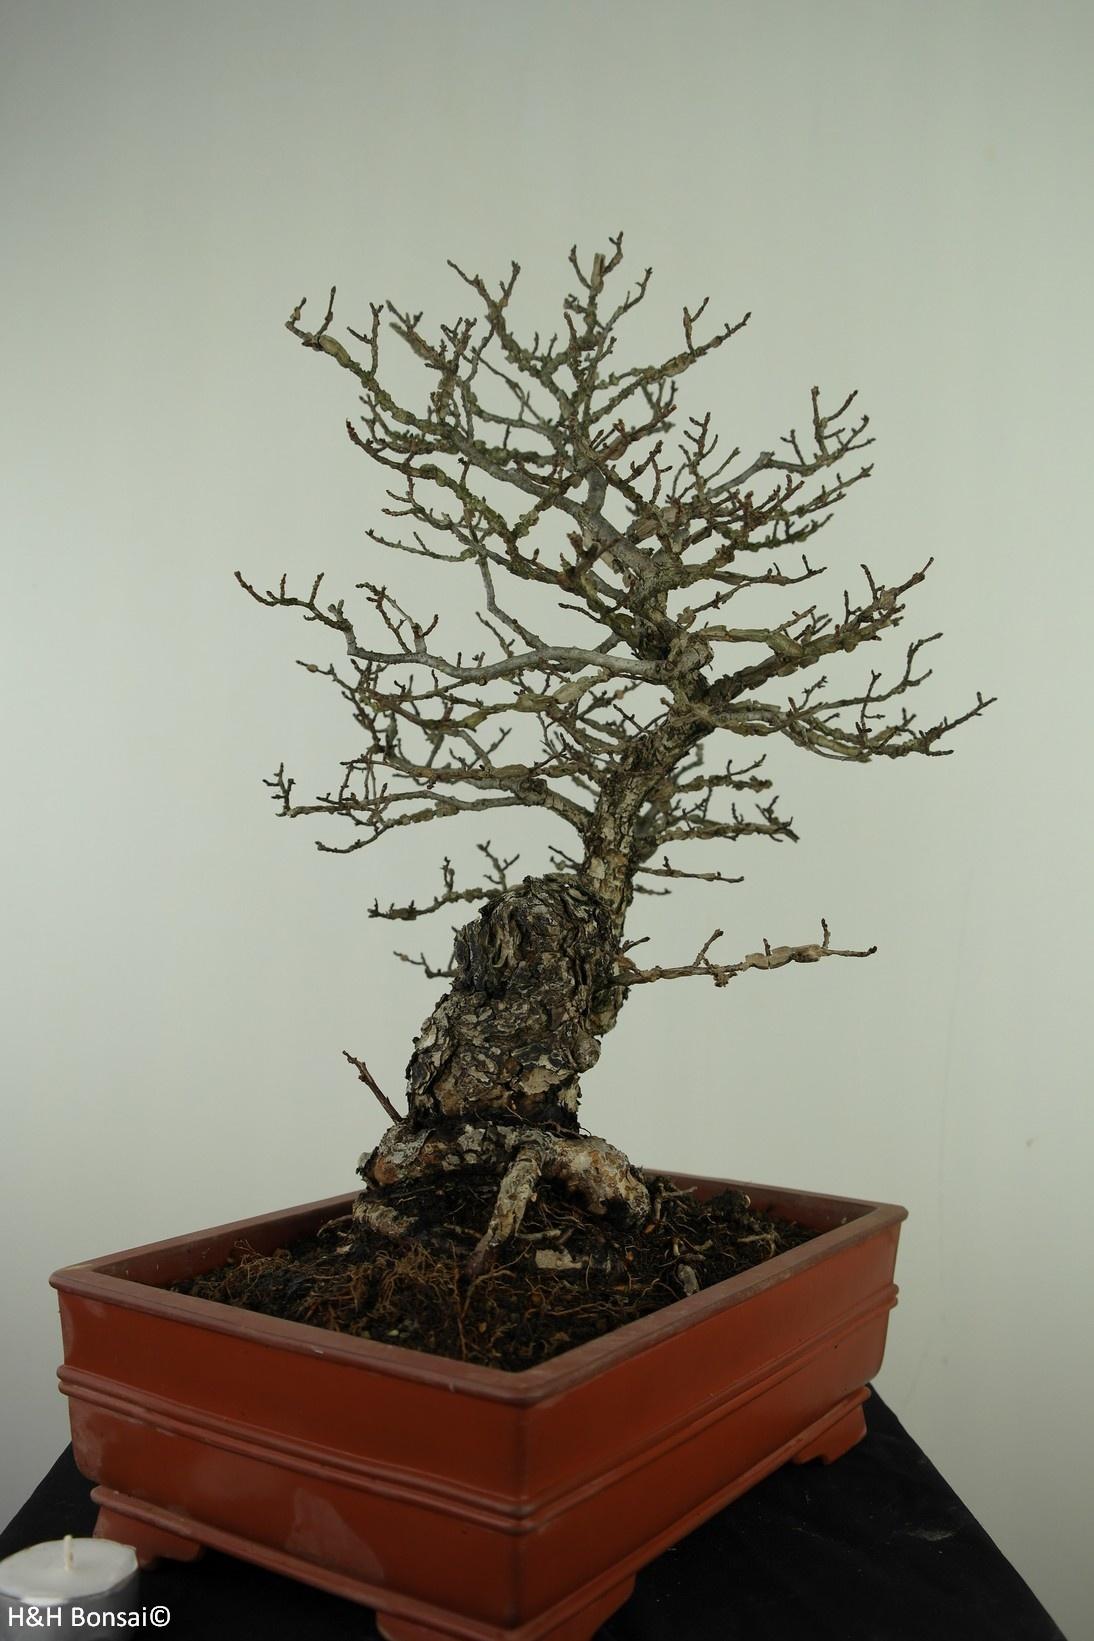 Bonsai Flügel-Spindelstrauch, Euonymus alatus, nr. 7514